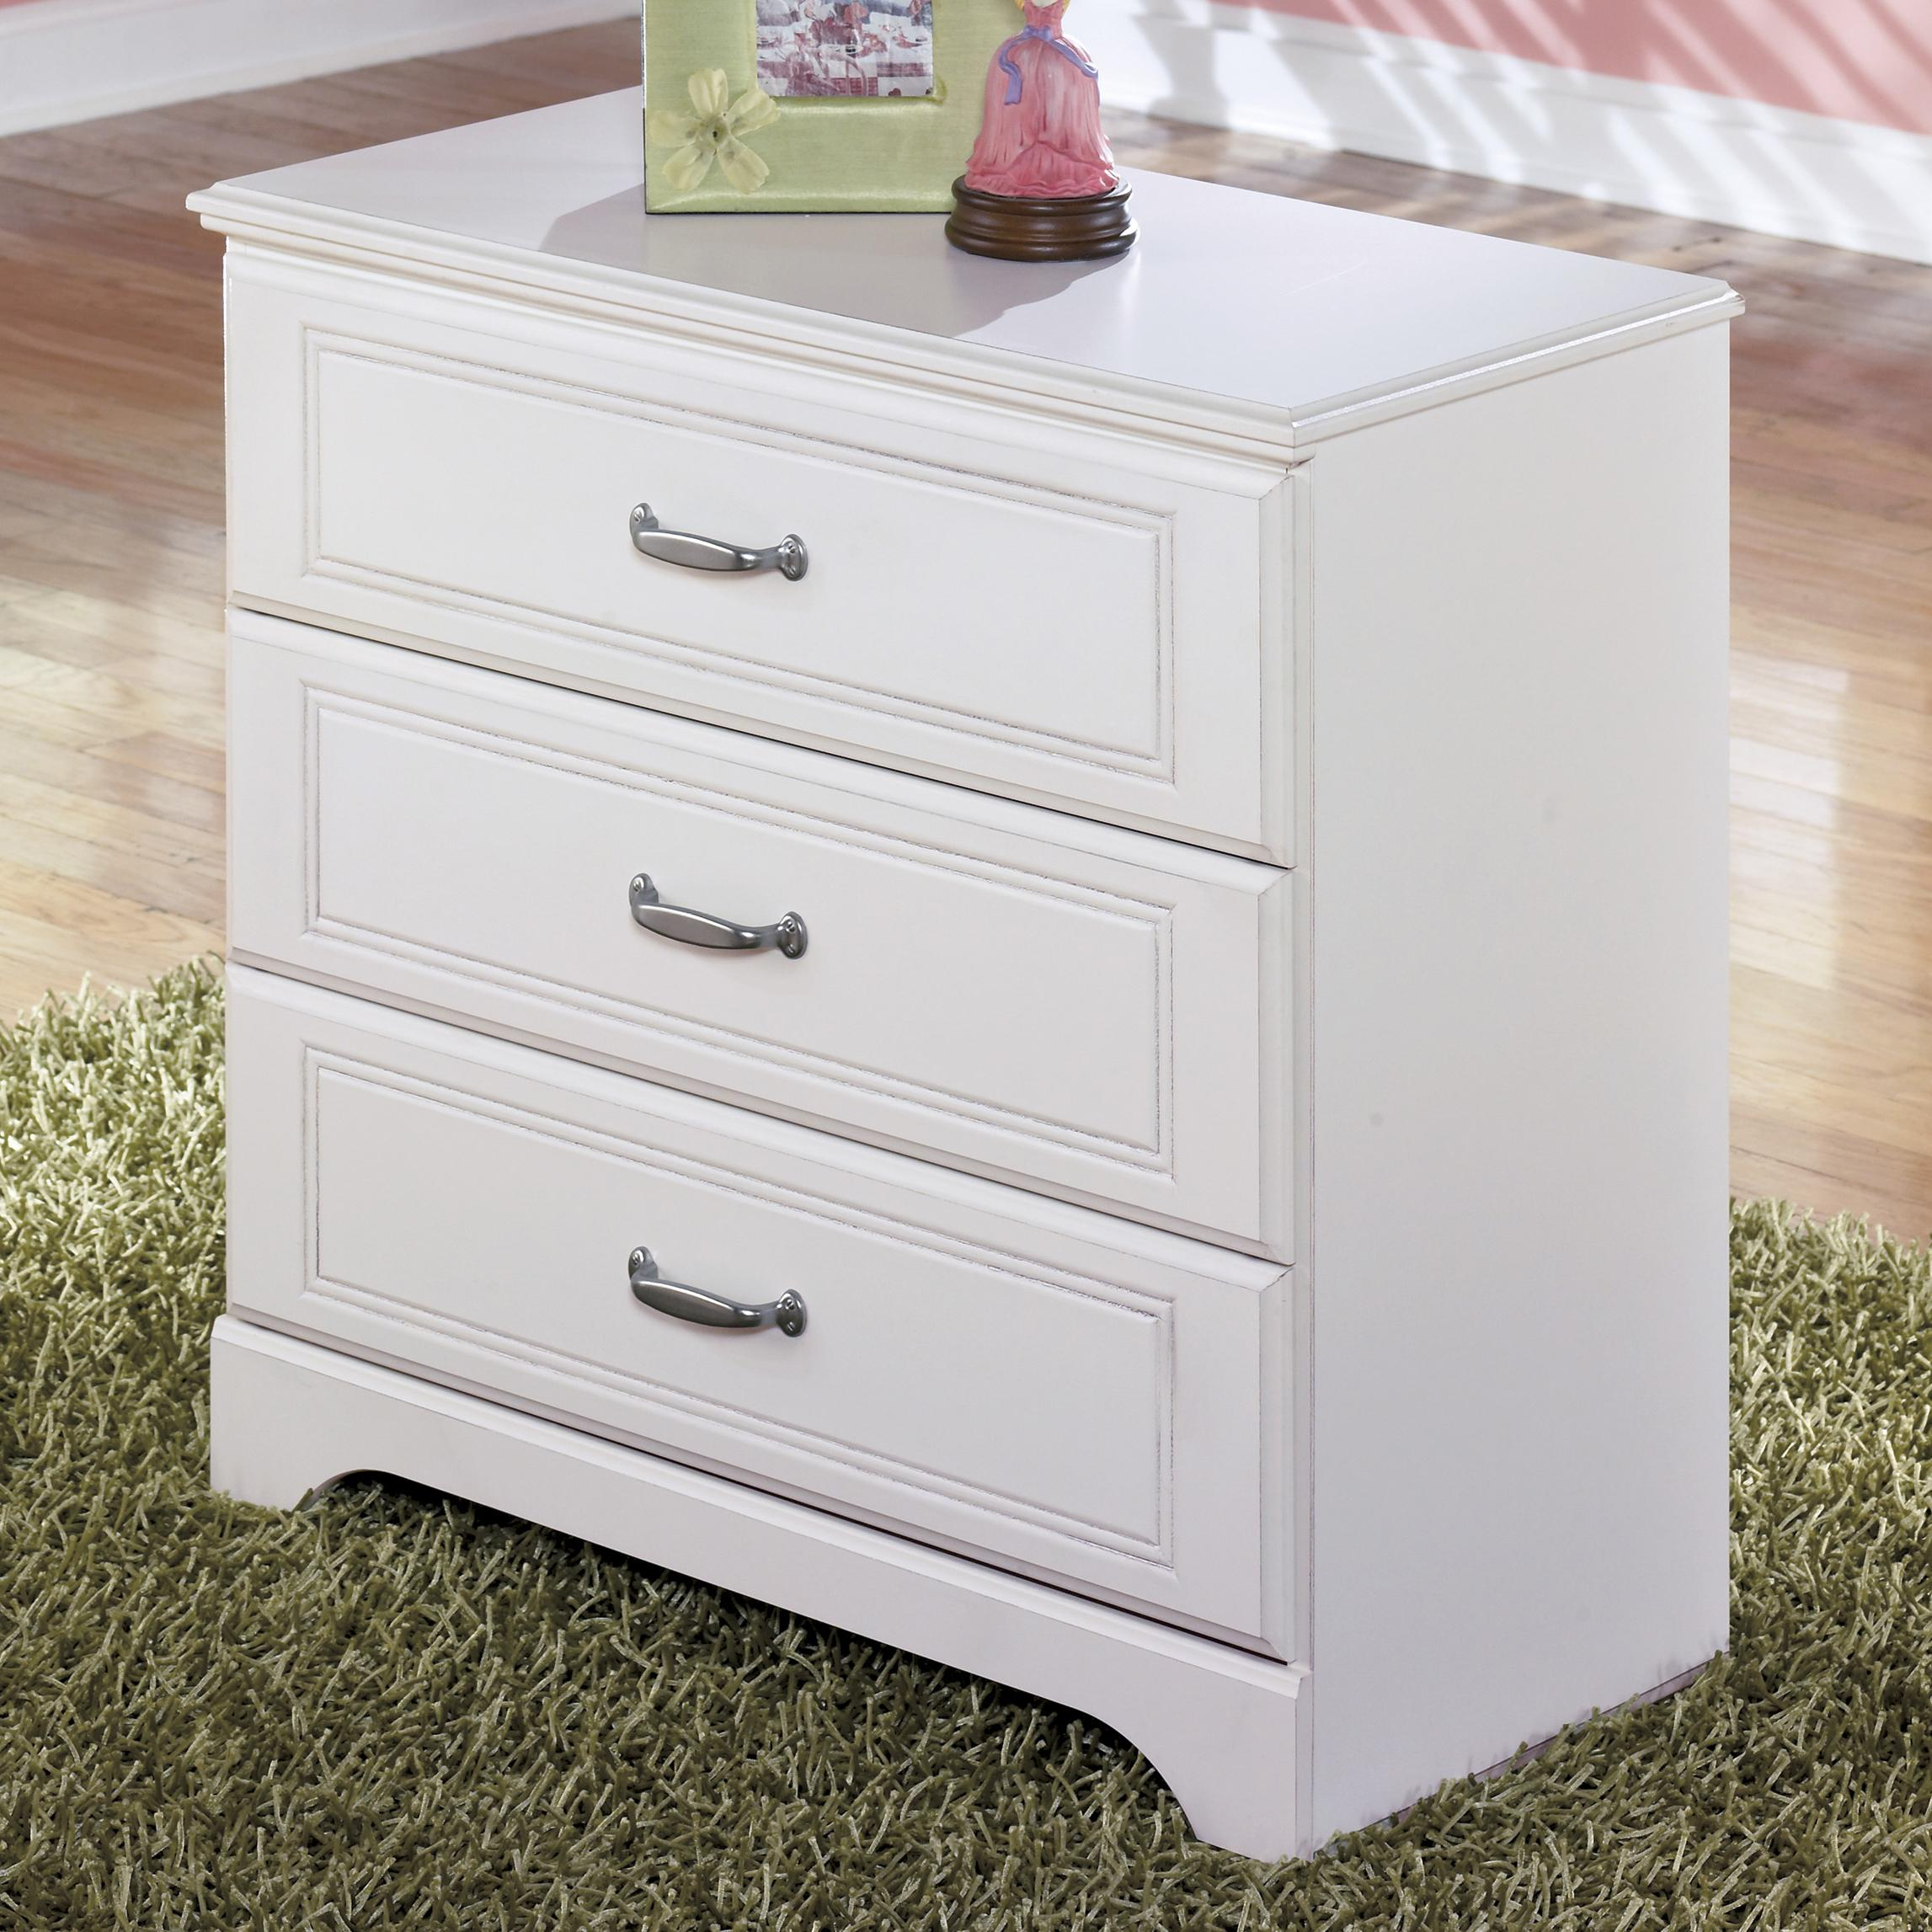 Lulu Loft Drawer Storage by Signature Design by Ashley at Nassau Furniture and Mattress